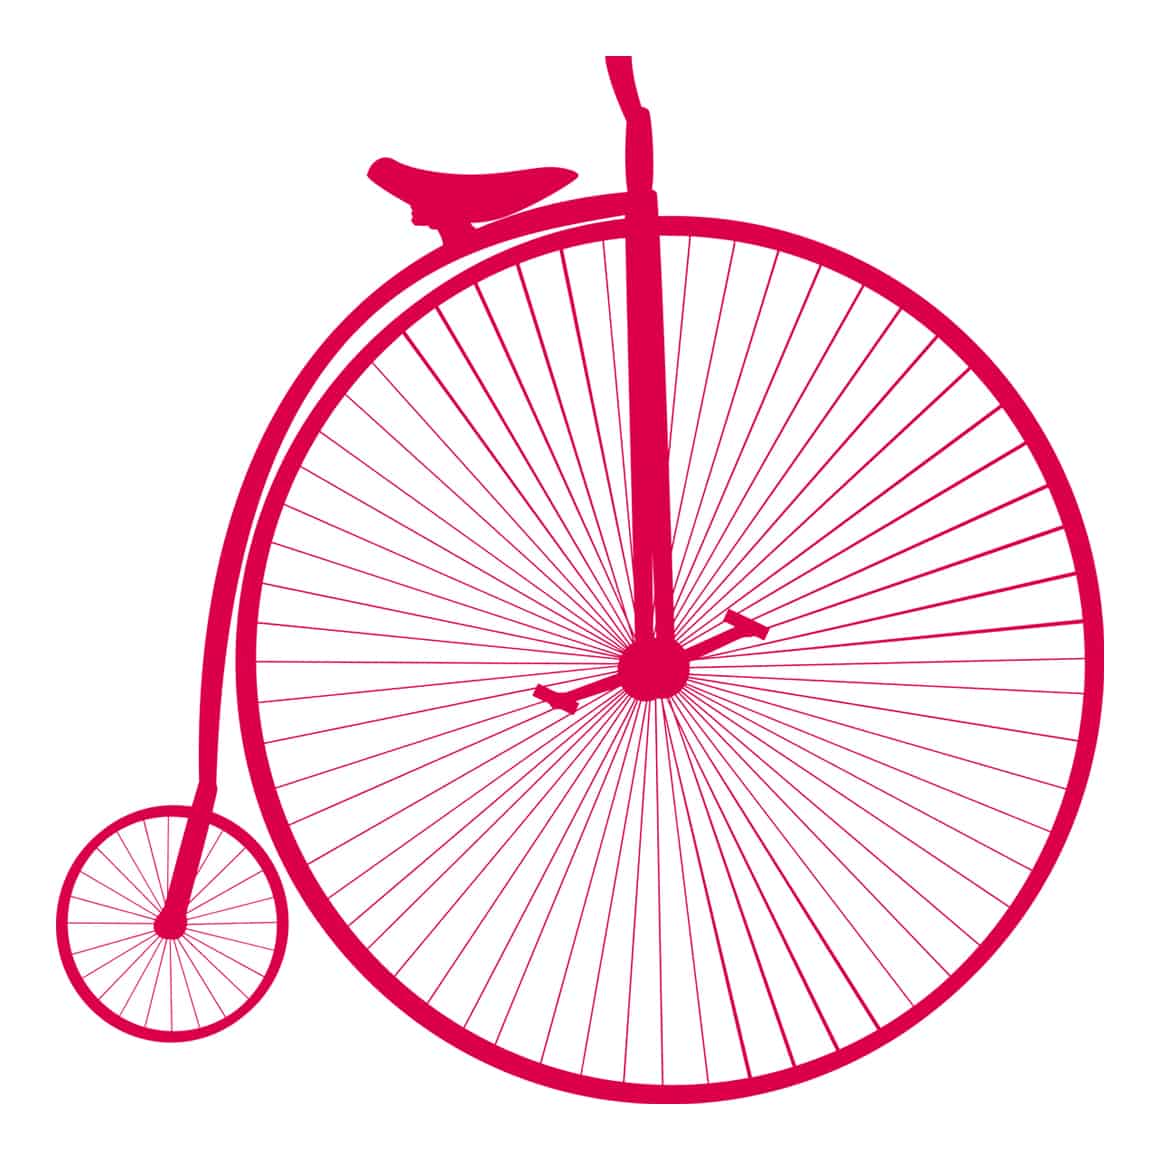 Incisiv -innovative carbon wheel made in belgium